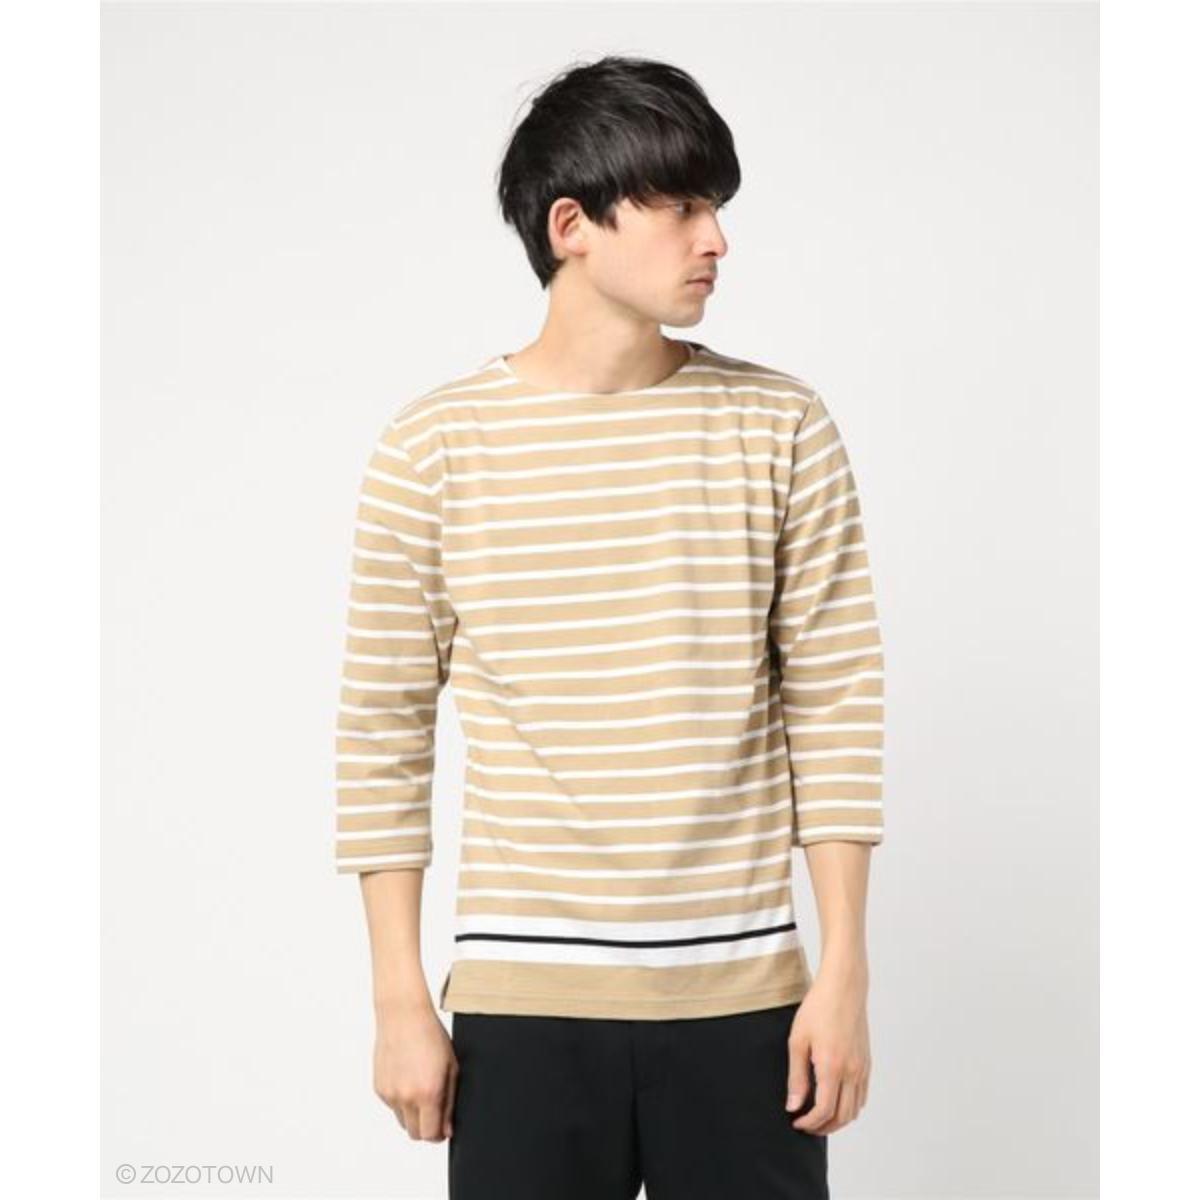 【nano・universe】 Tシャツ カットソー 長袖 メンズ